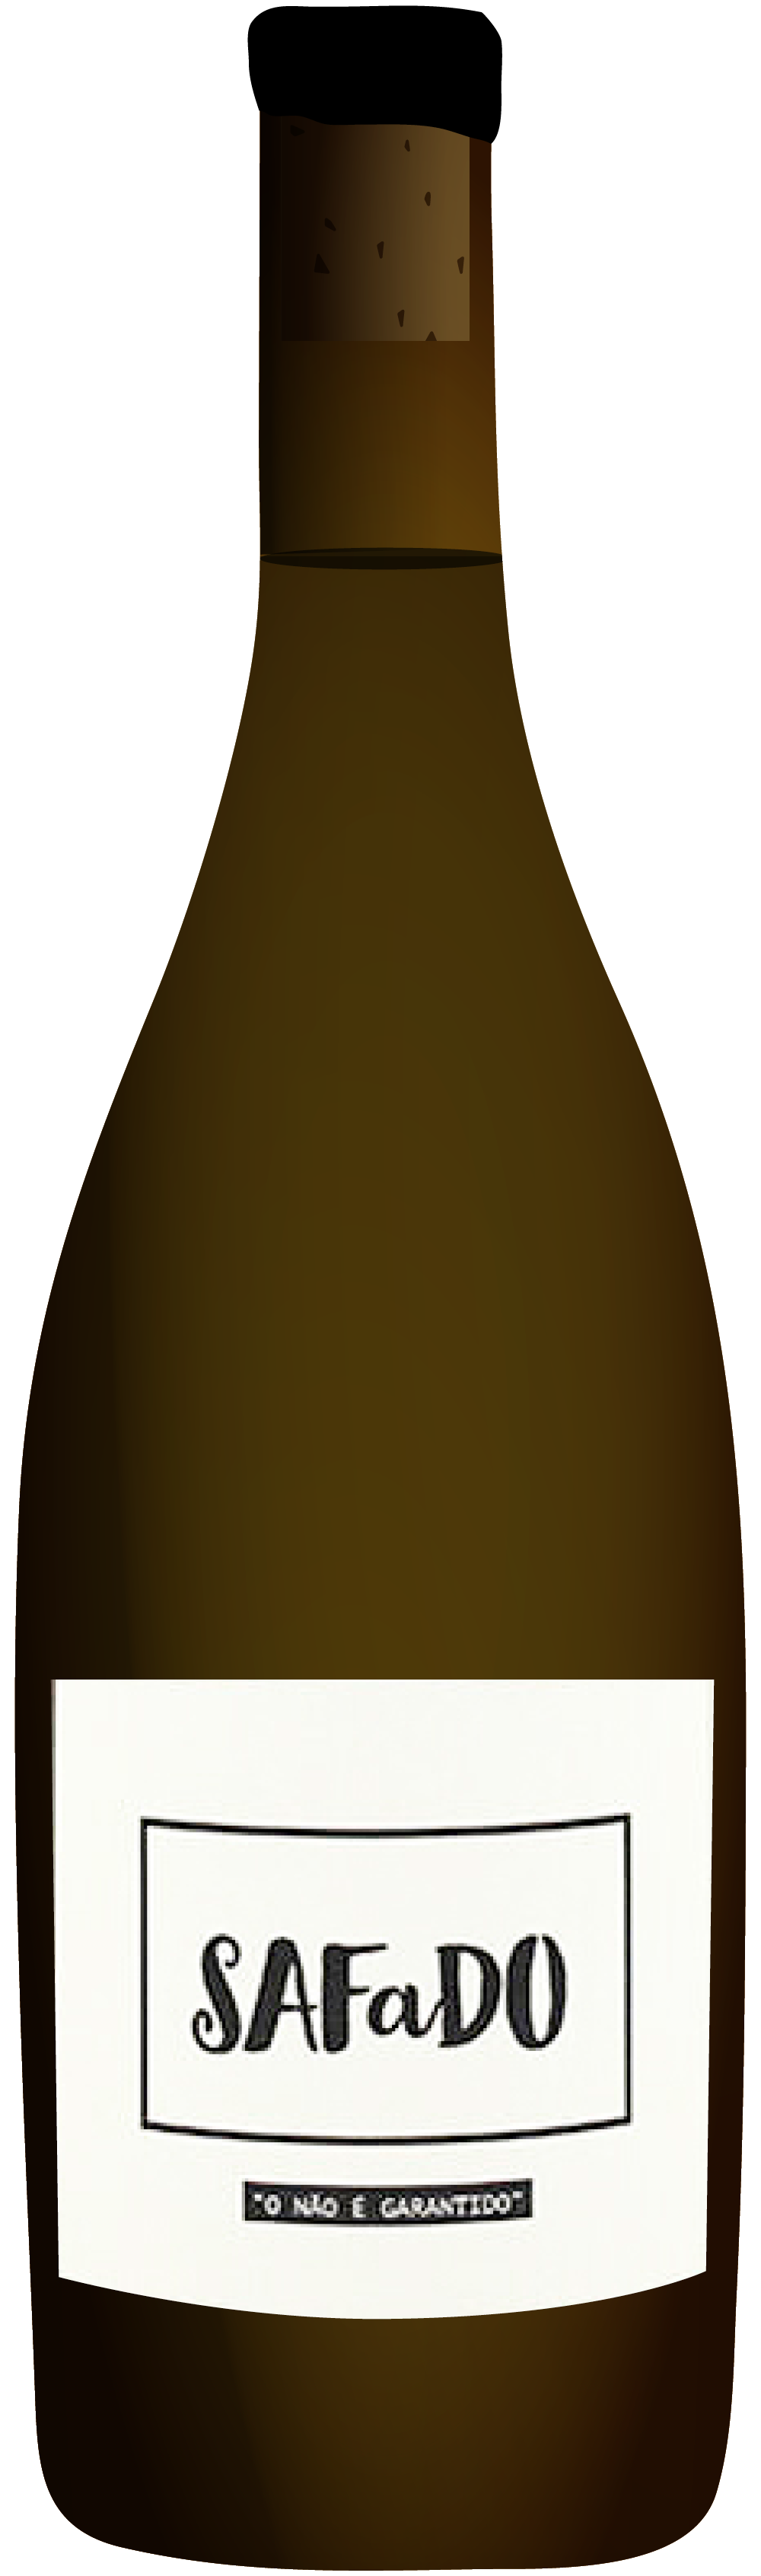 the natural wine company club may 2021 portugal safado safado 2019